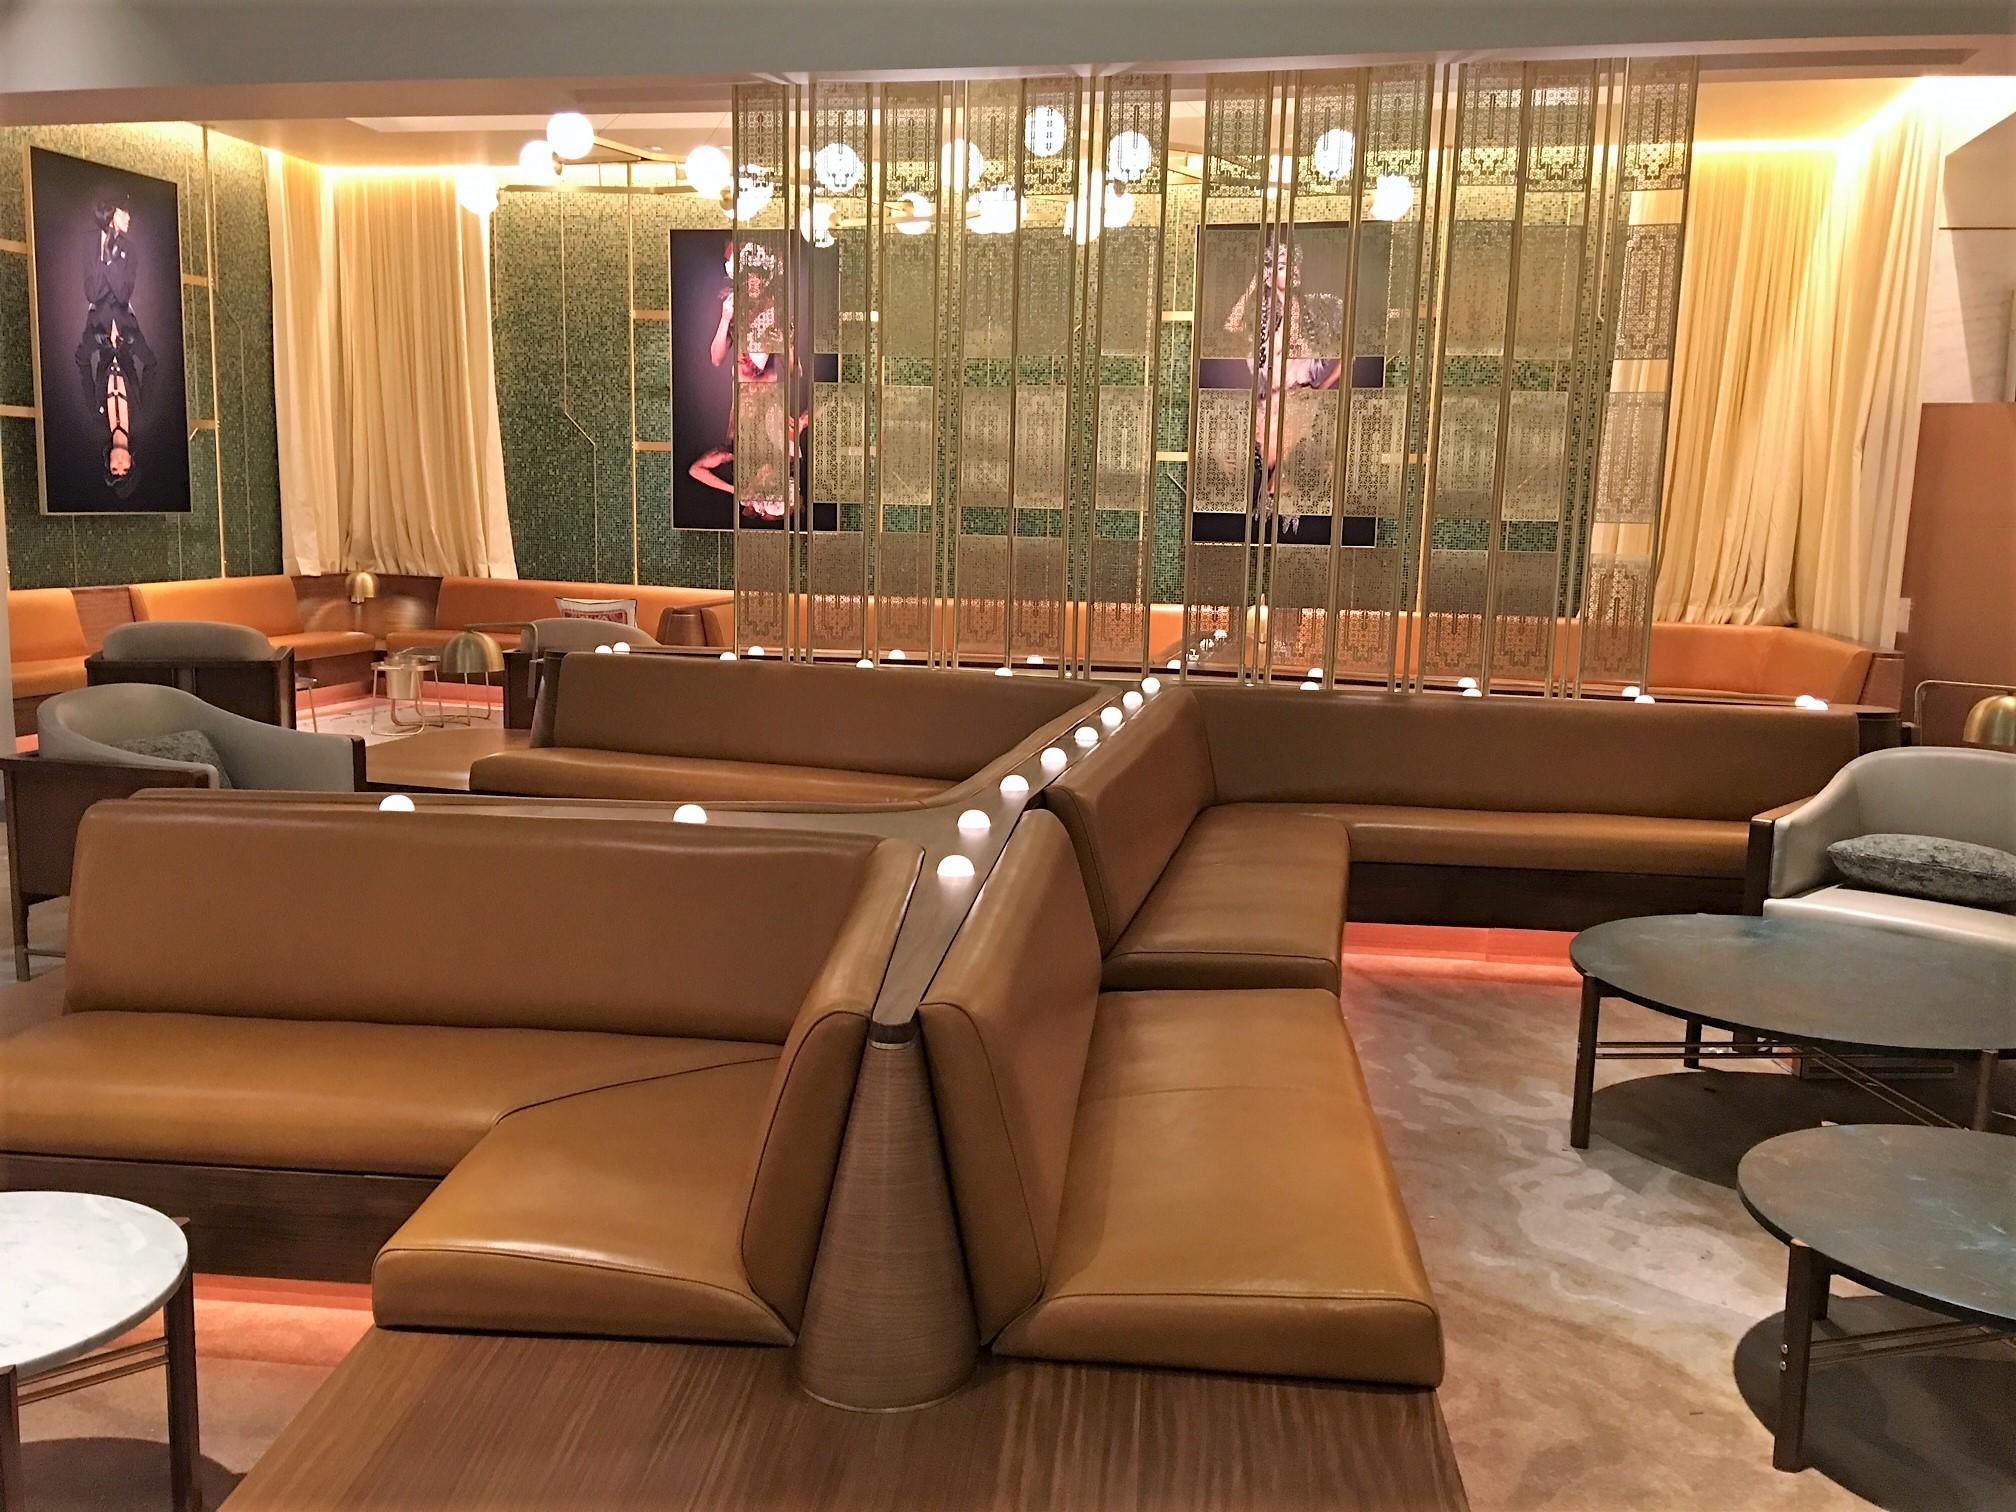 The W Living Room Bar @ The W Las Vegas